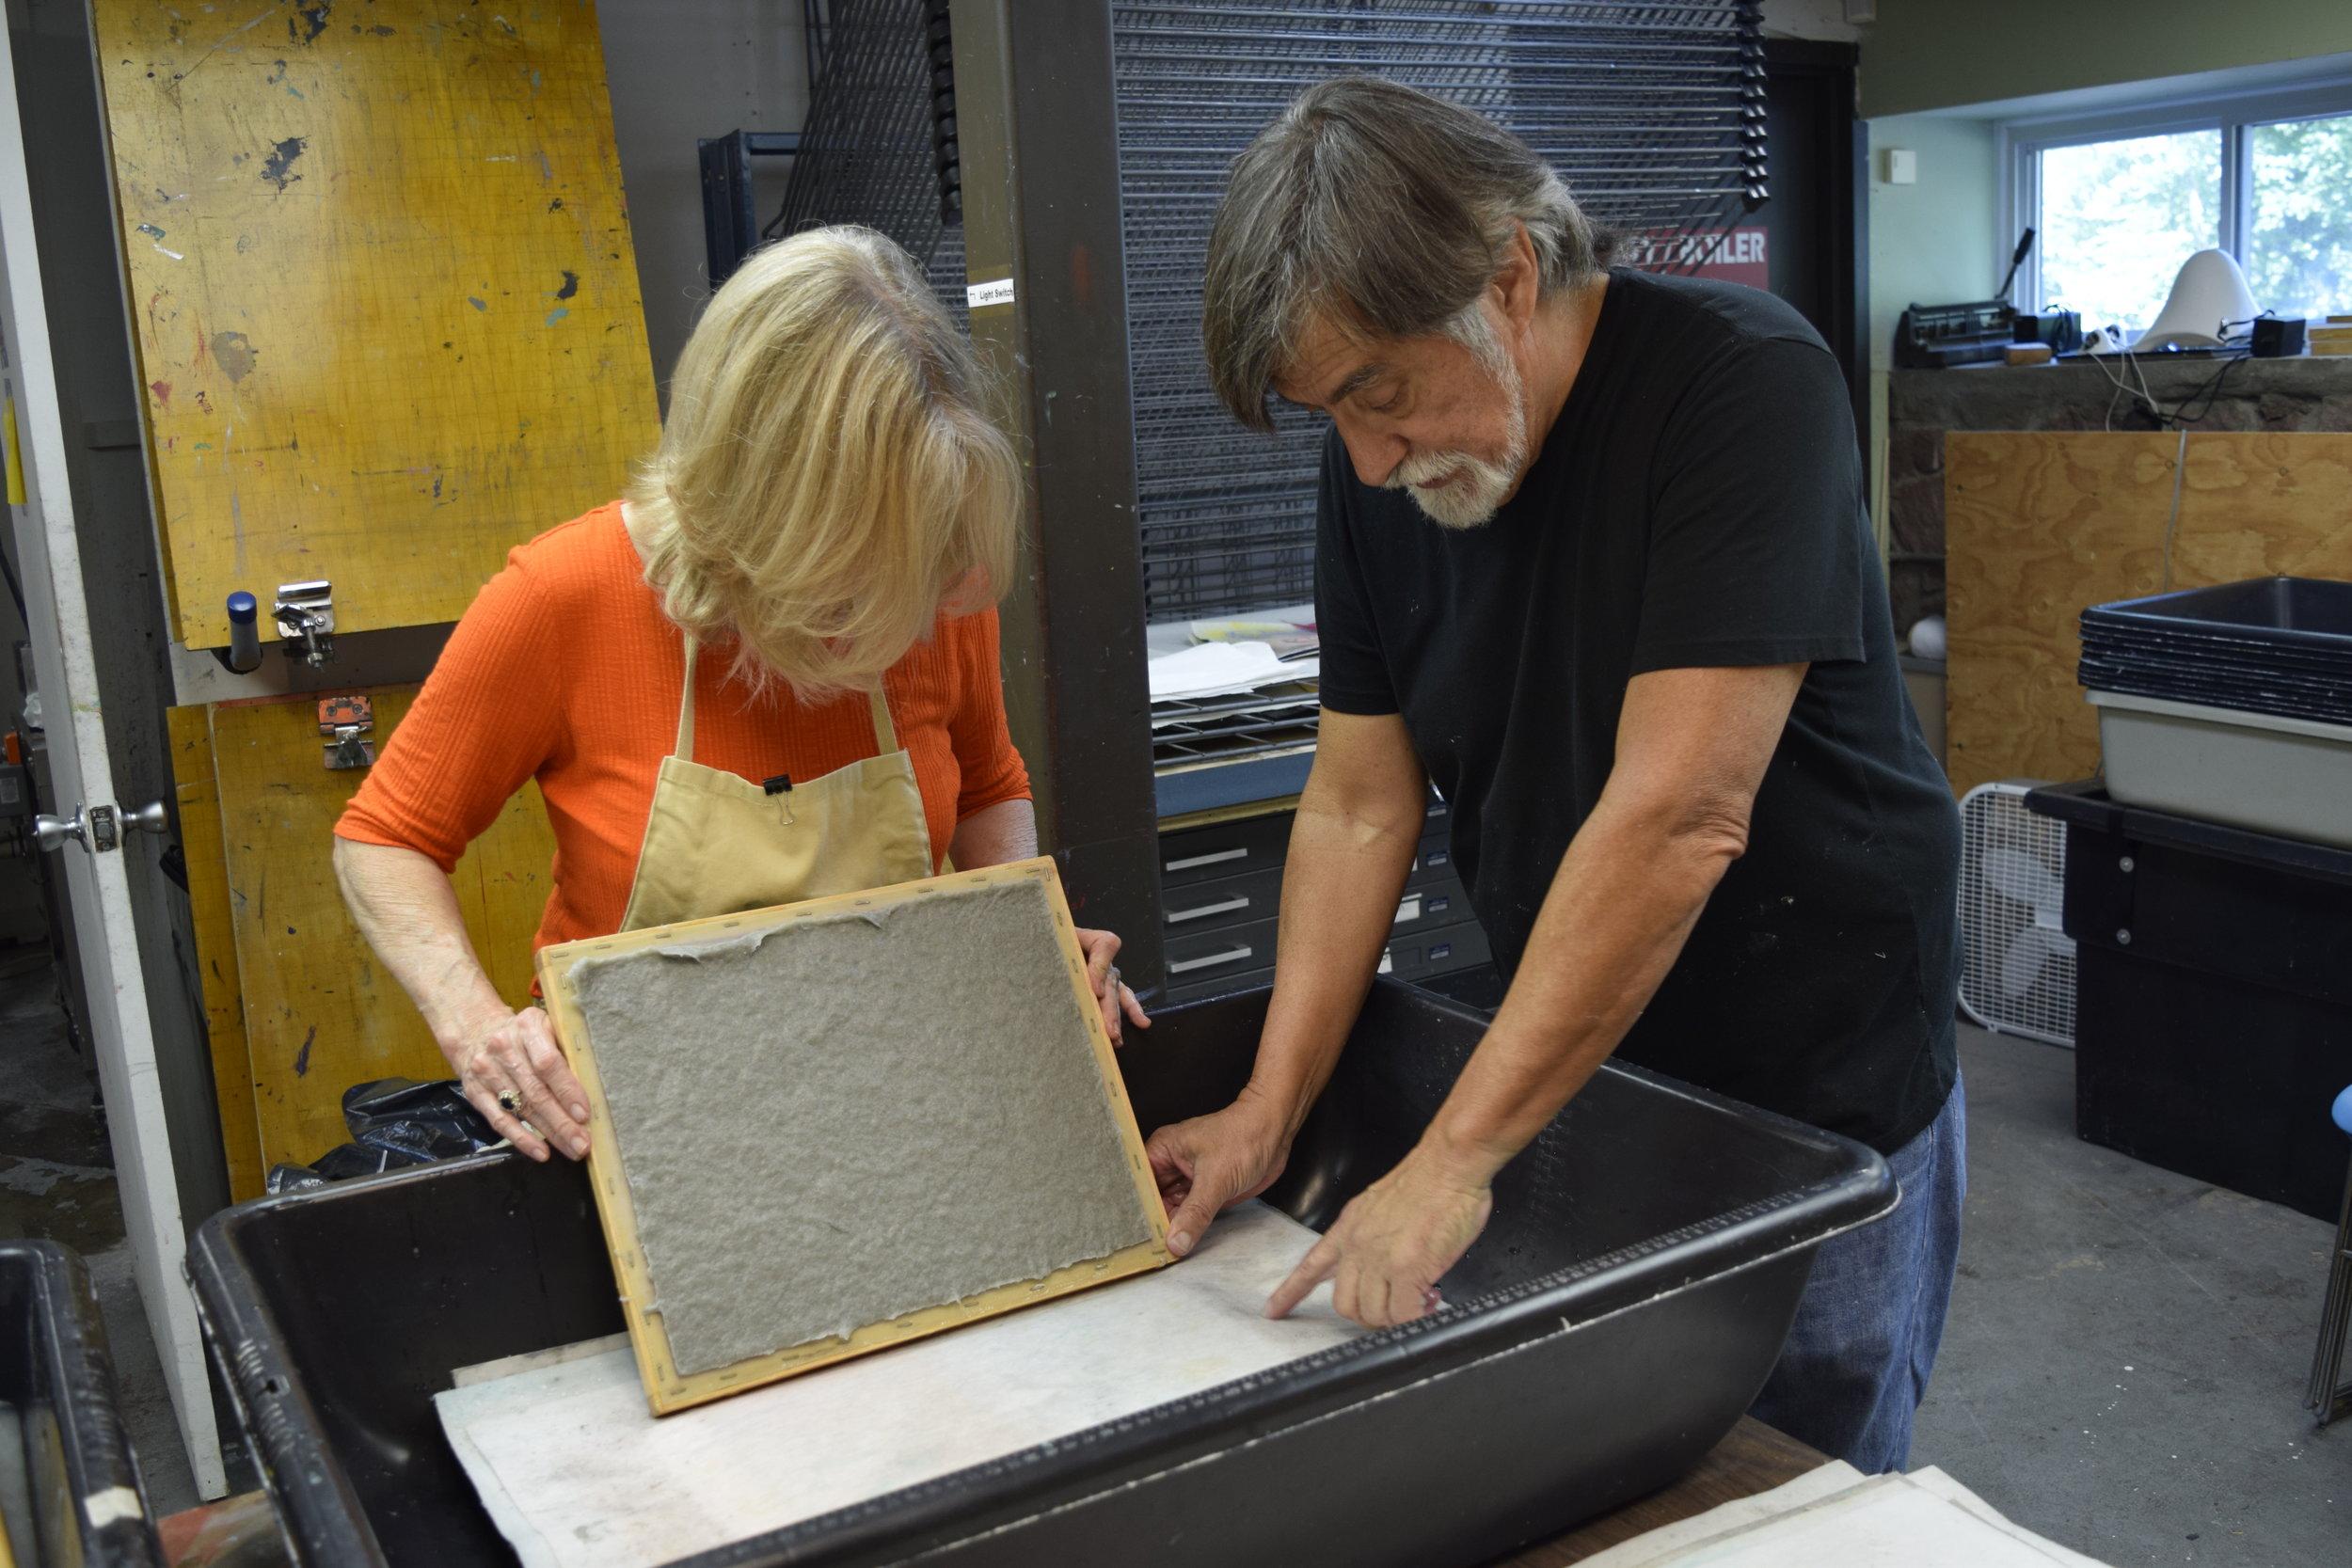 Walt Nygard teaching non-veterans how to make handmade paper from military uniforms